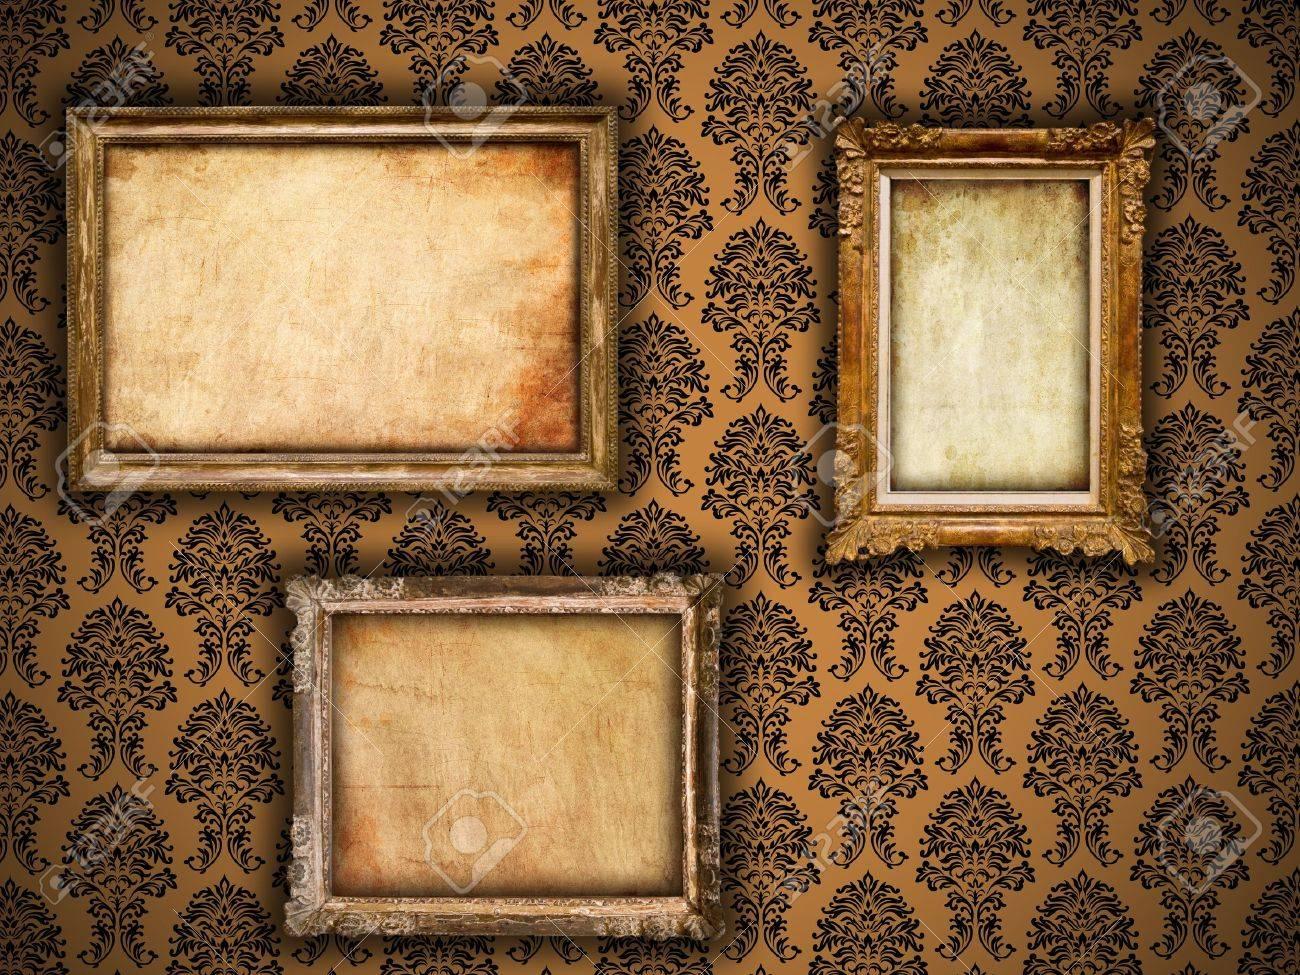 Gilded frames on vintage damask style wallpaper background and gilded frames on vintage damask style wallpaper background and grunge retro paper inserts stock photo jeuxipadfo Gallery